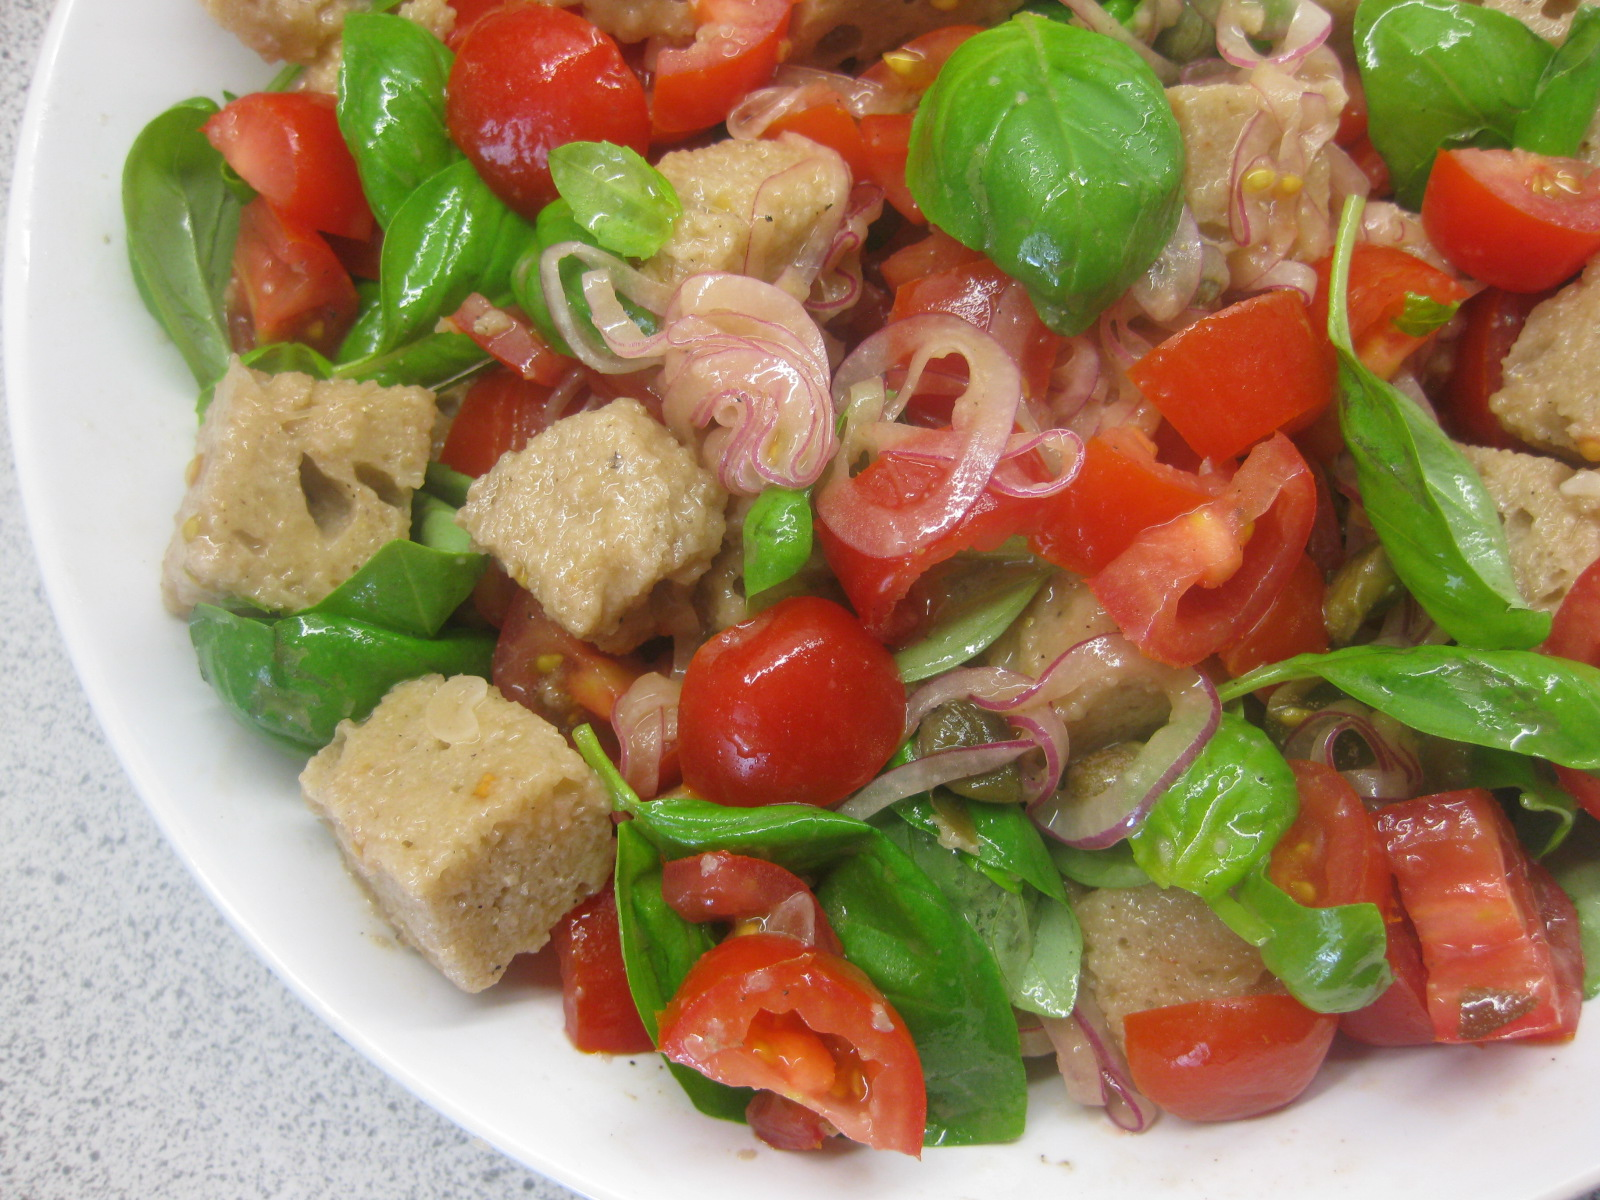 Klidmoster.dk: Panzanella - italiensk brødsalat...